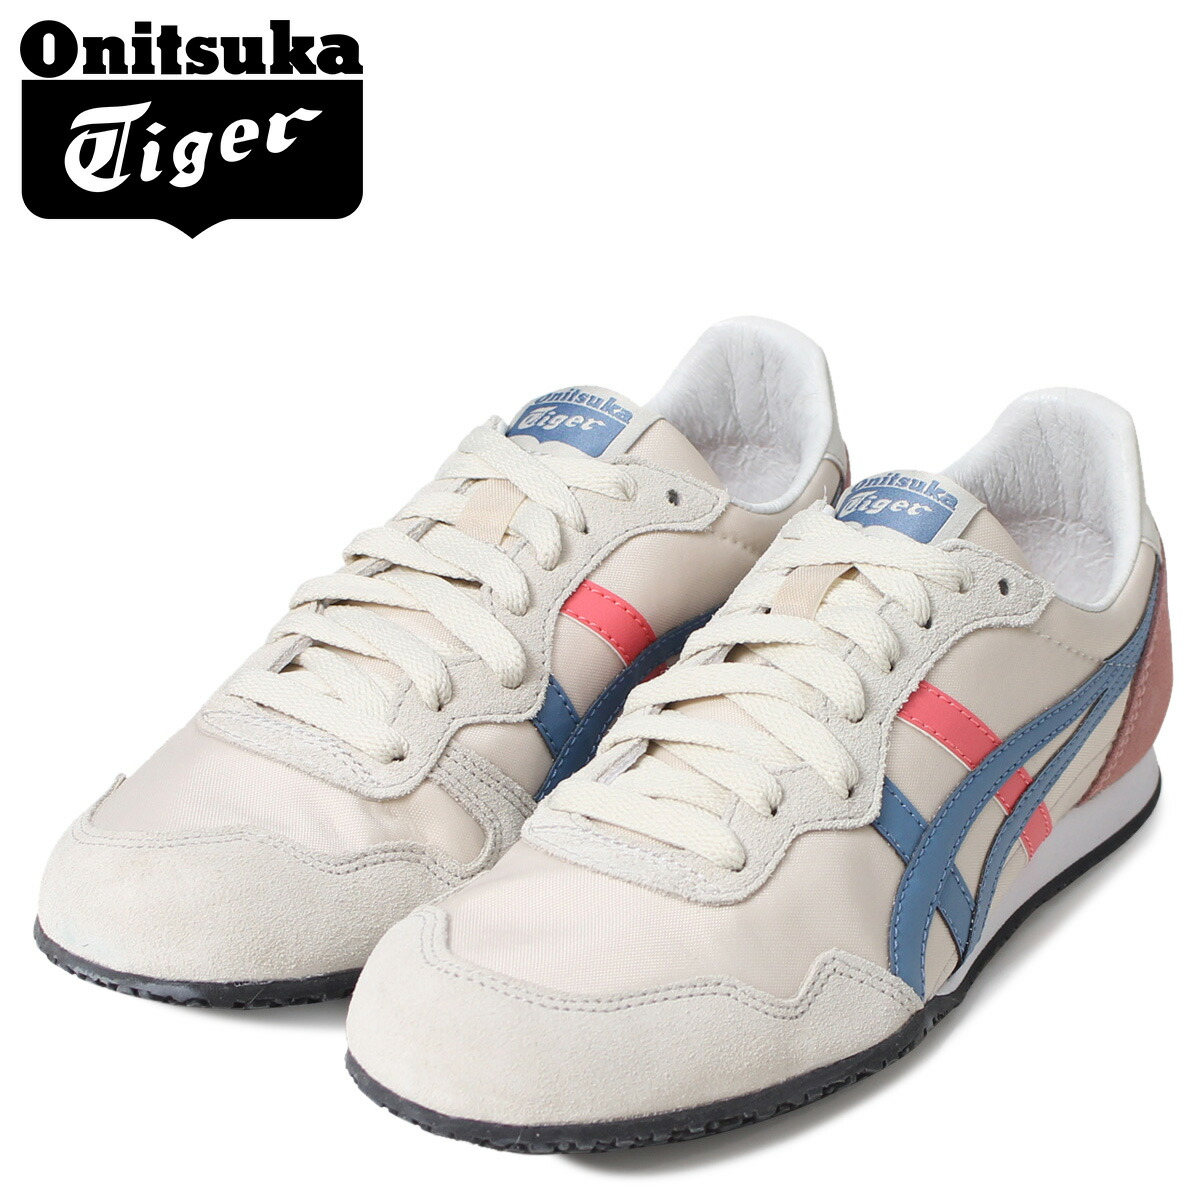 Buy onitsuka tiger serrano th109l \u003e Up